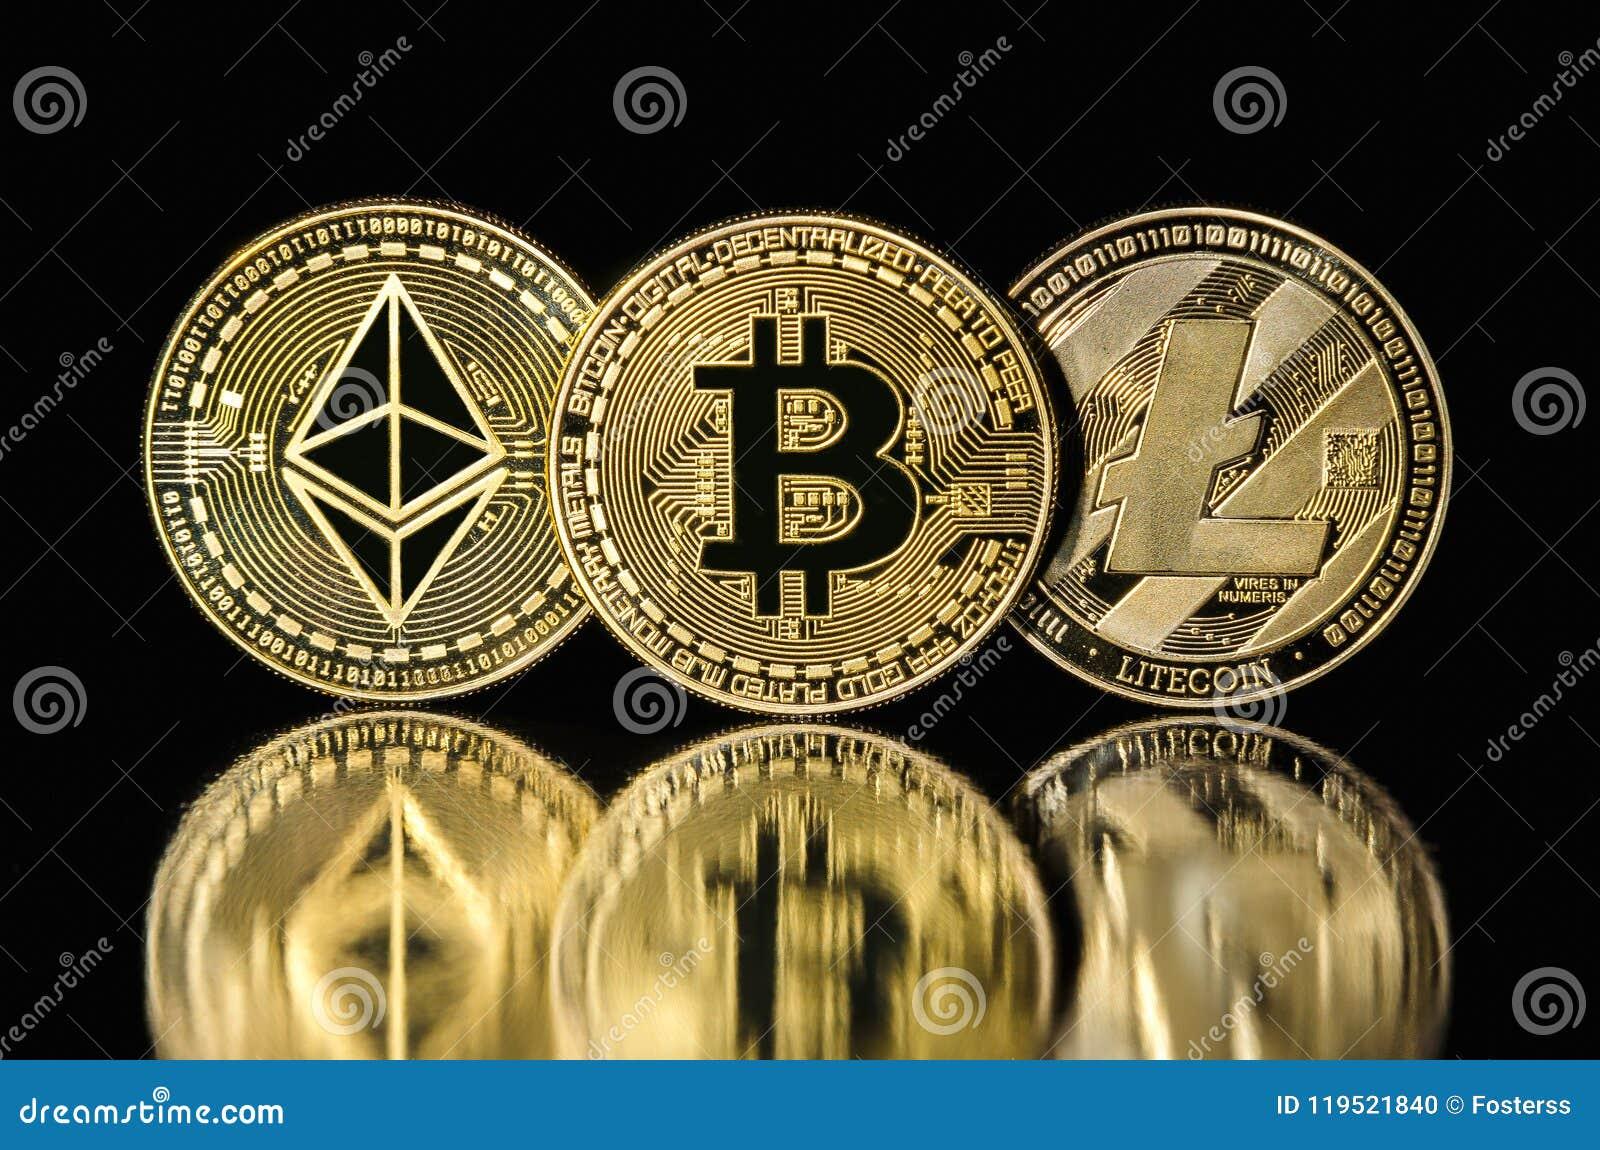 buy bitcoin litecoin or ethereum